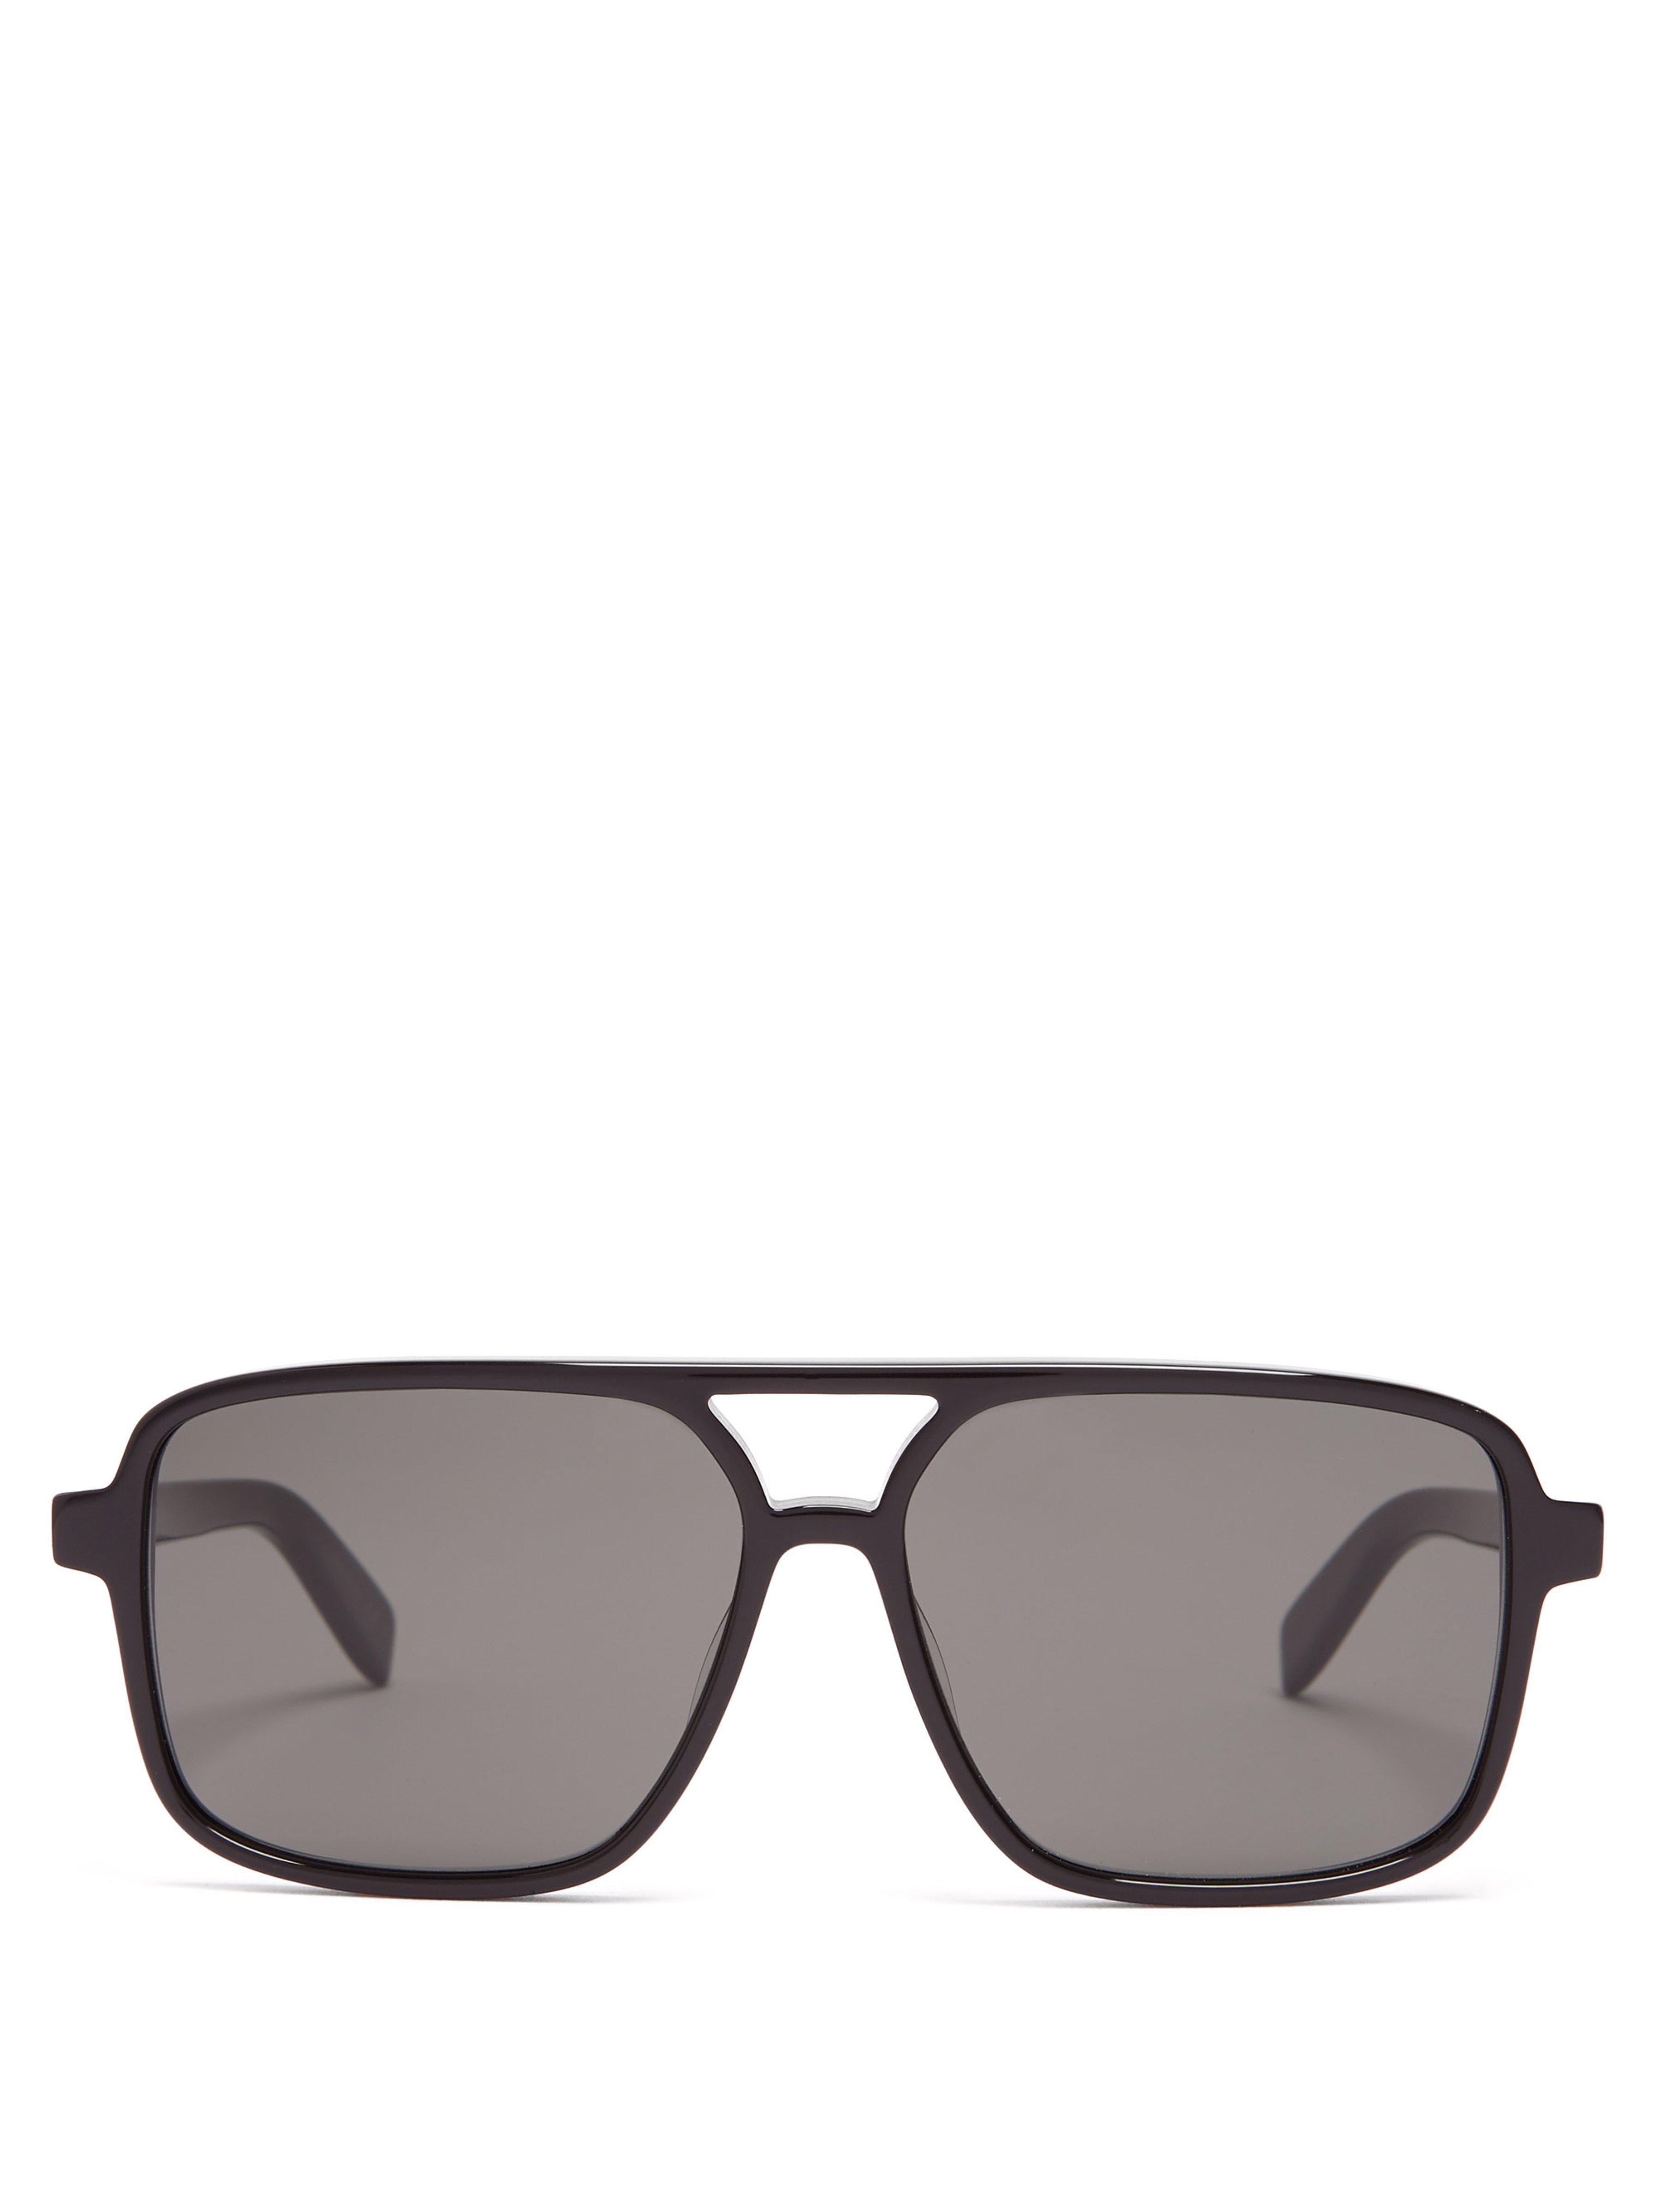 1642d601f45f Saint Laurent D Frame Acetate Sunglasses in Black for Men - Lyst